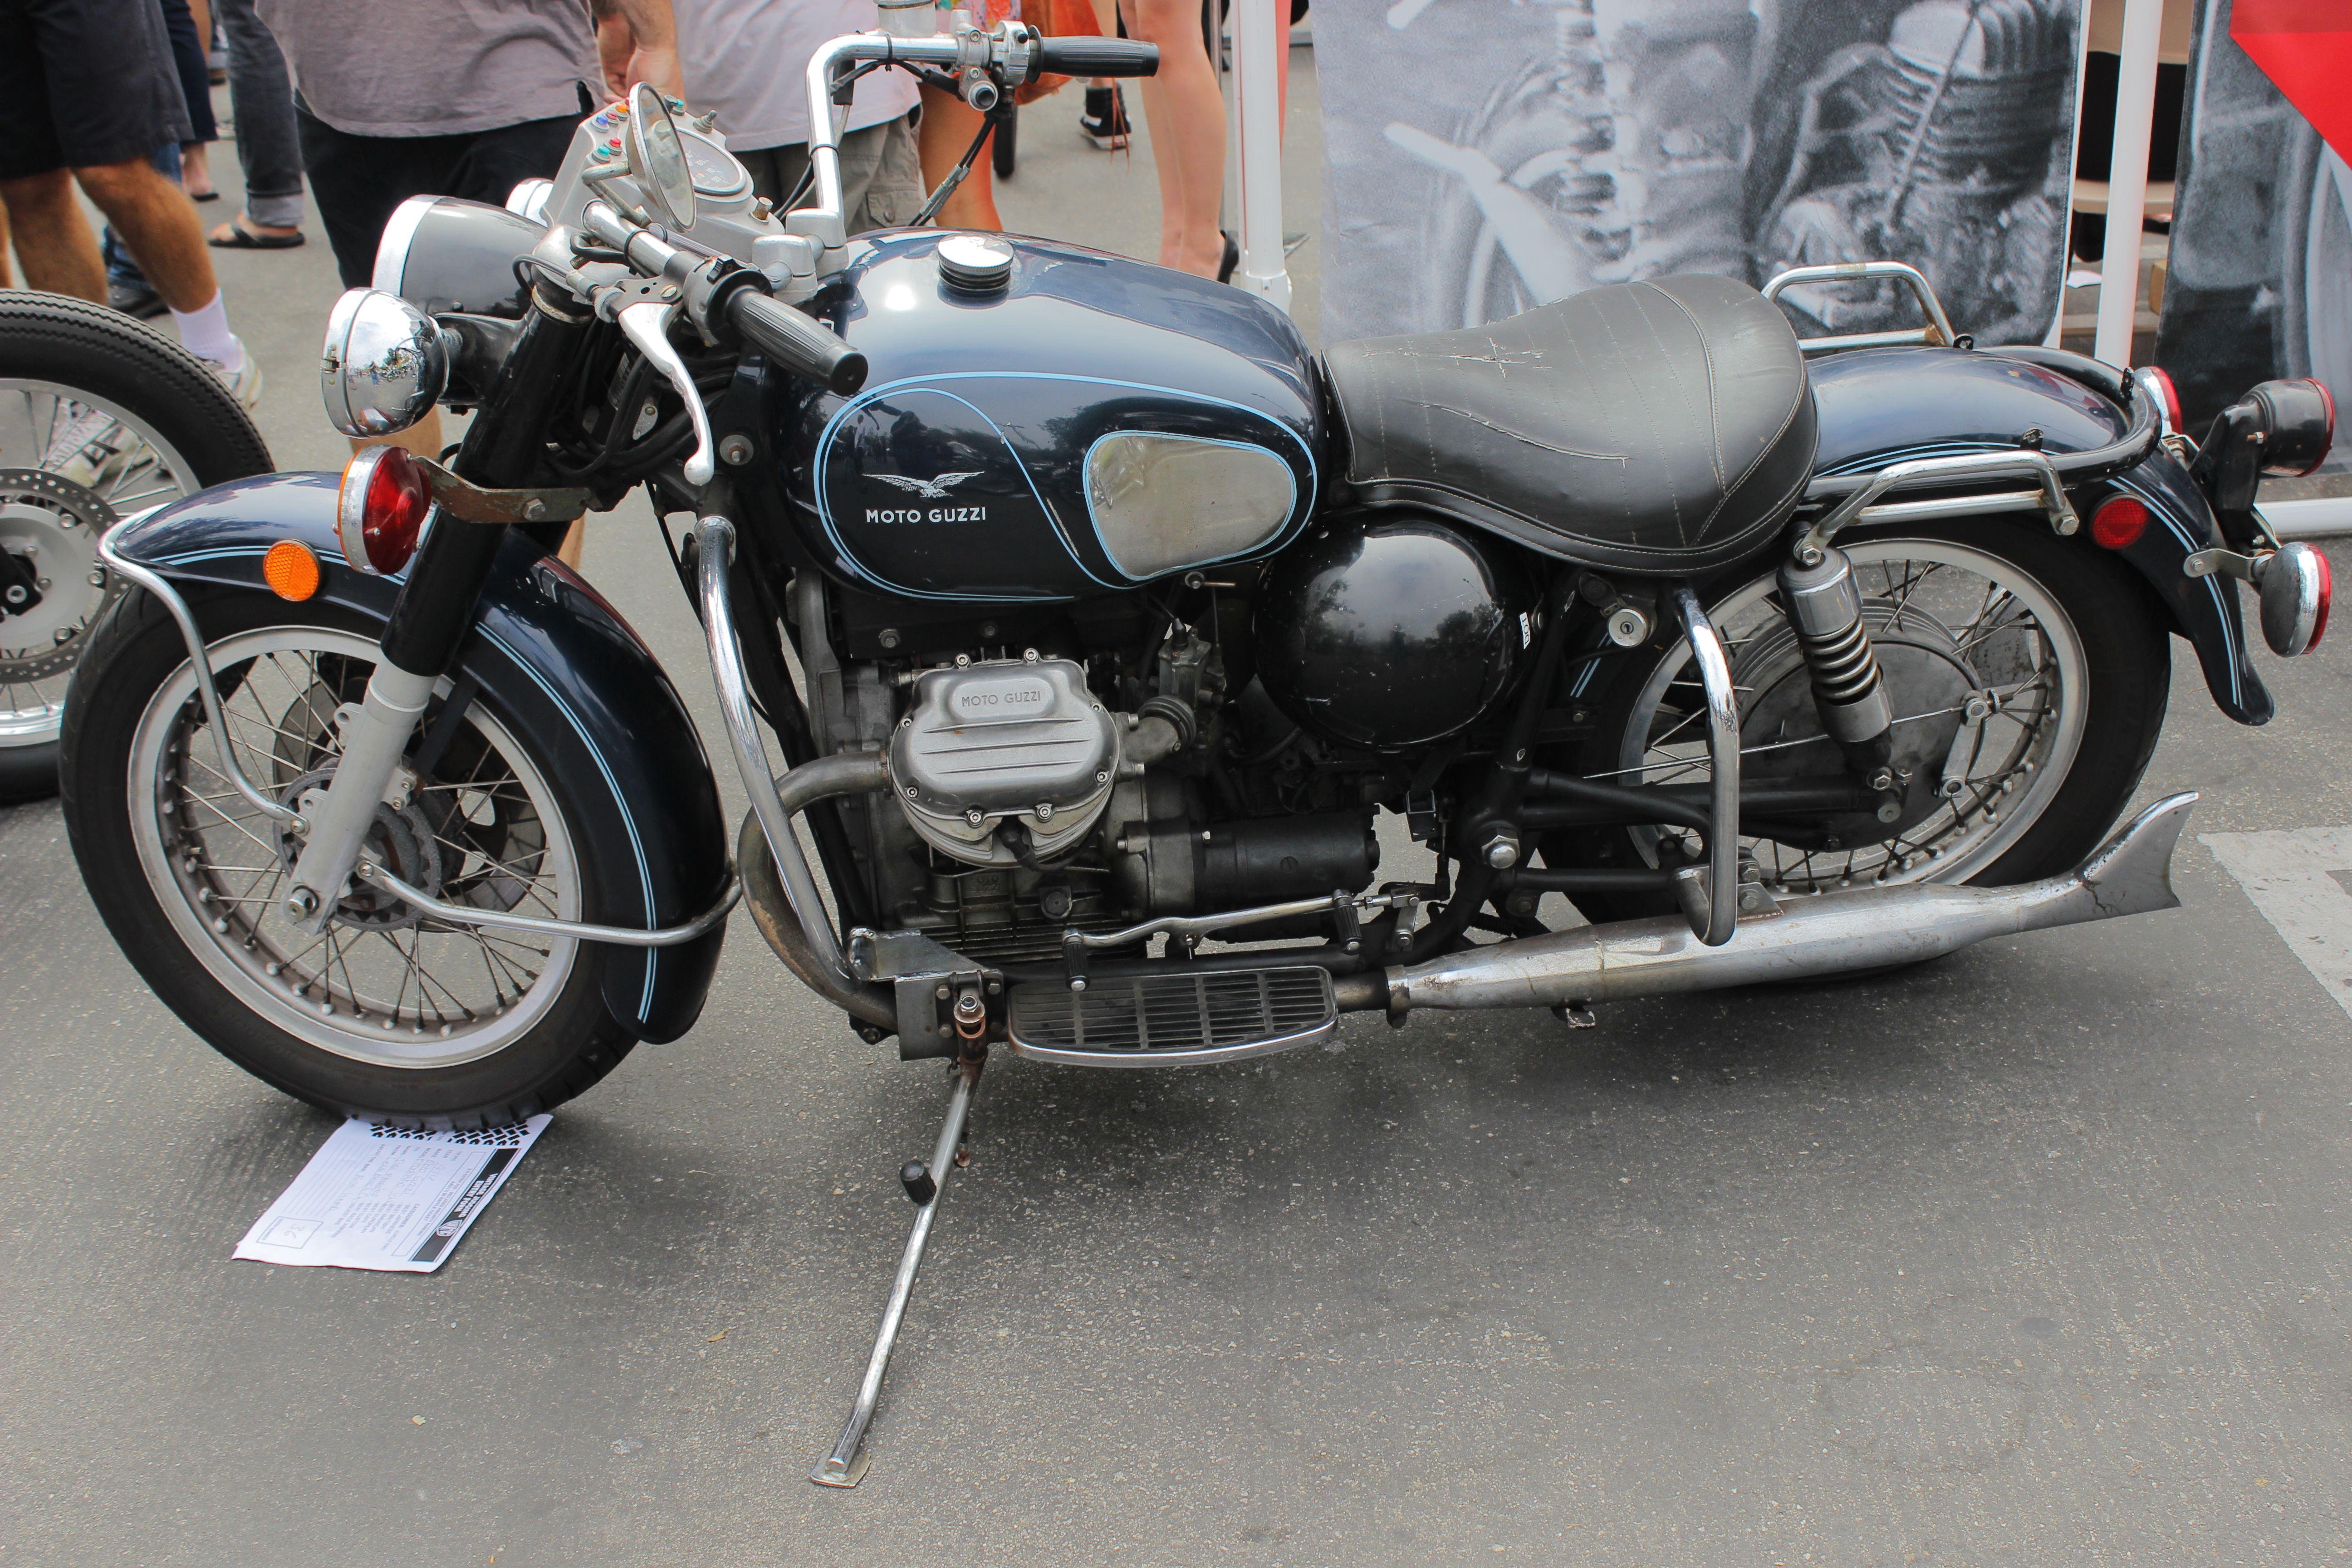 1974 moto guzzi eldorado 850 by alucard214 [ 5184 x 3456 Pixel ]